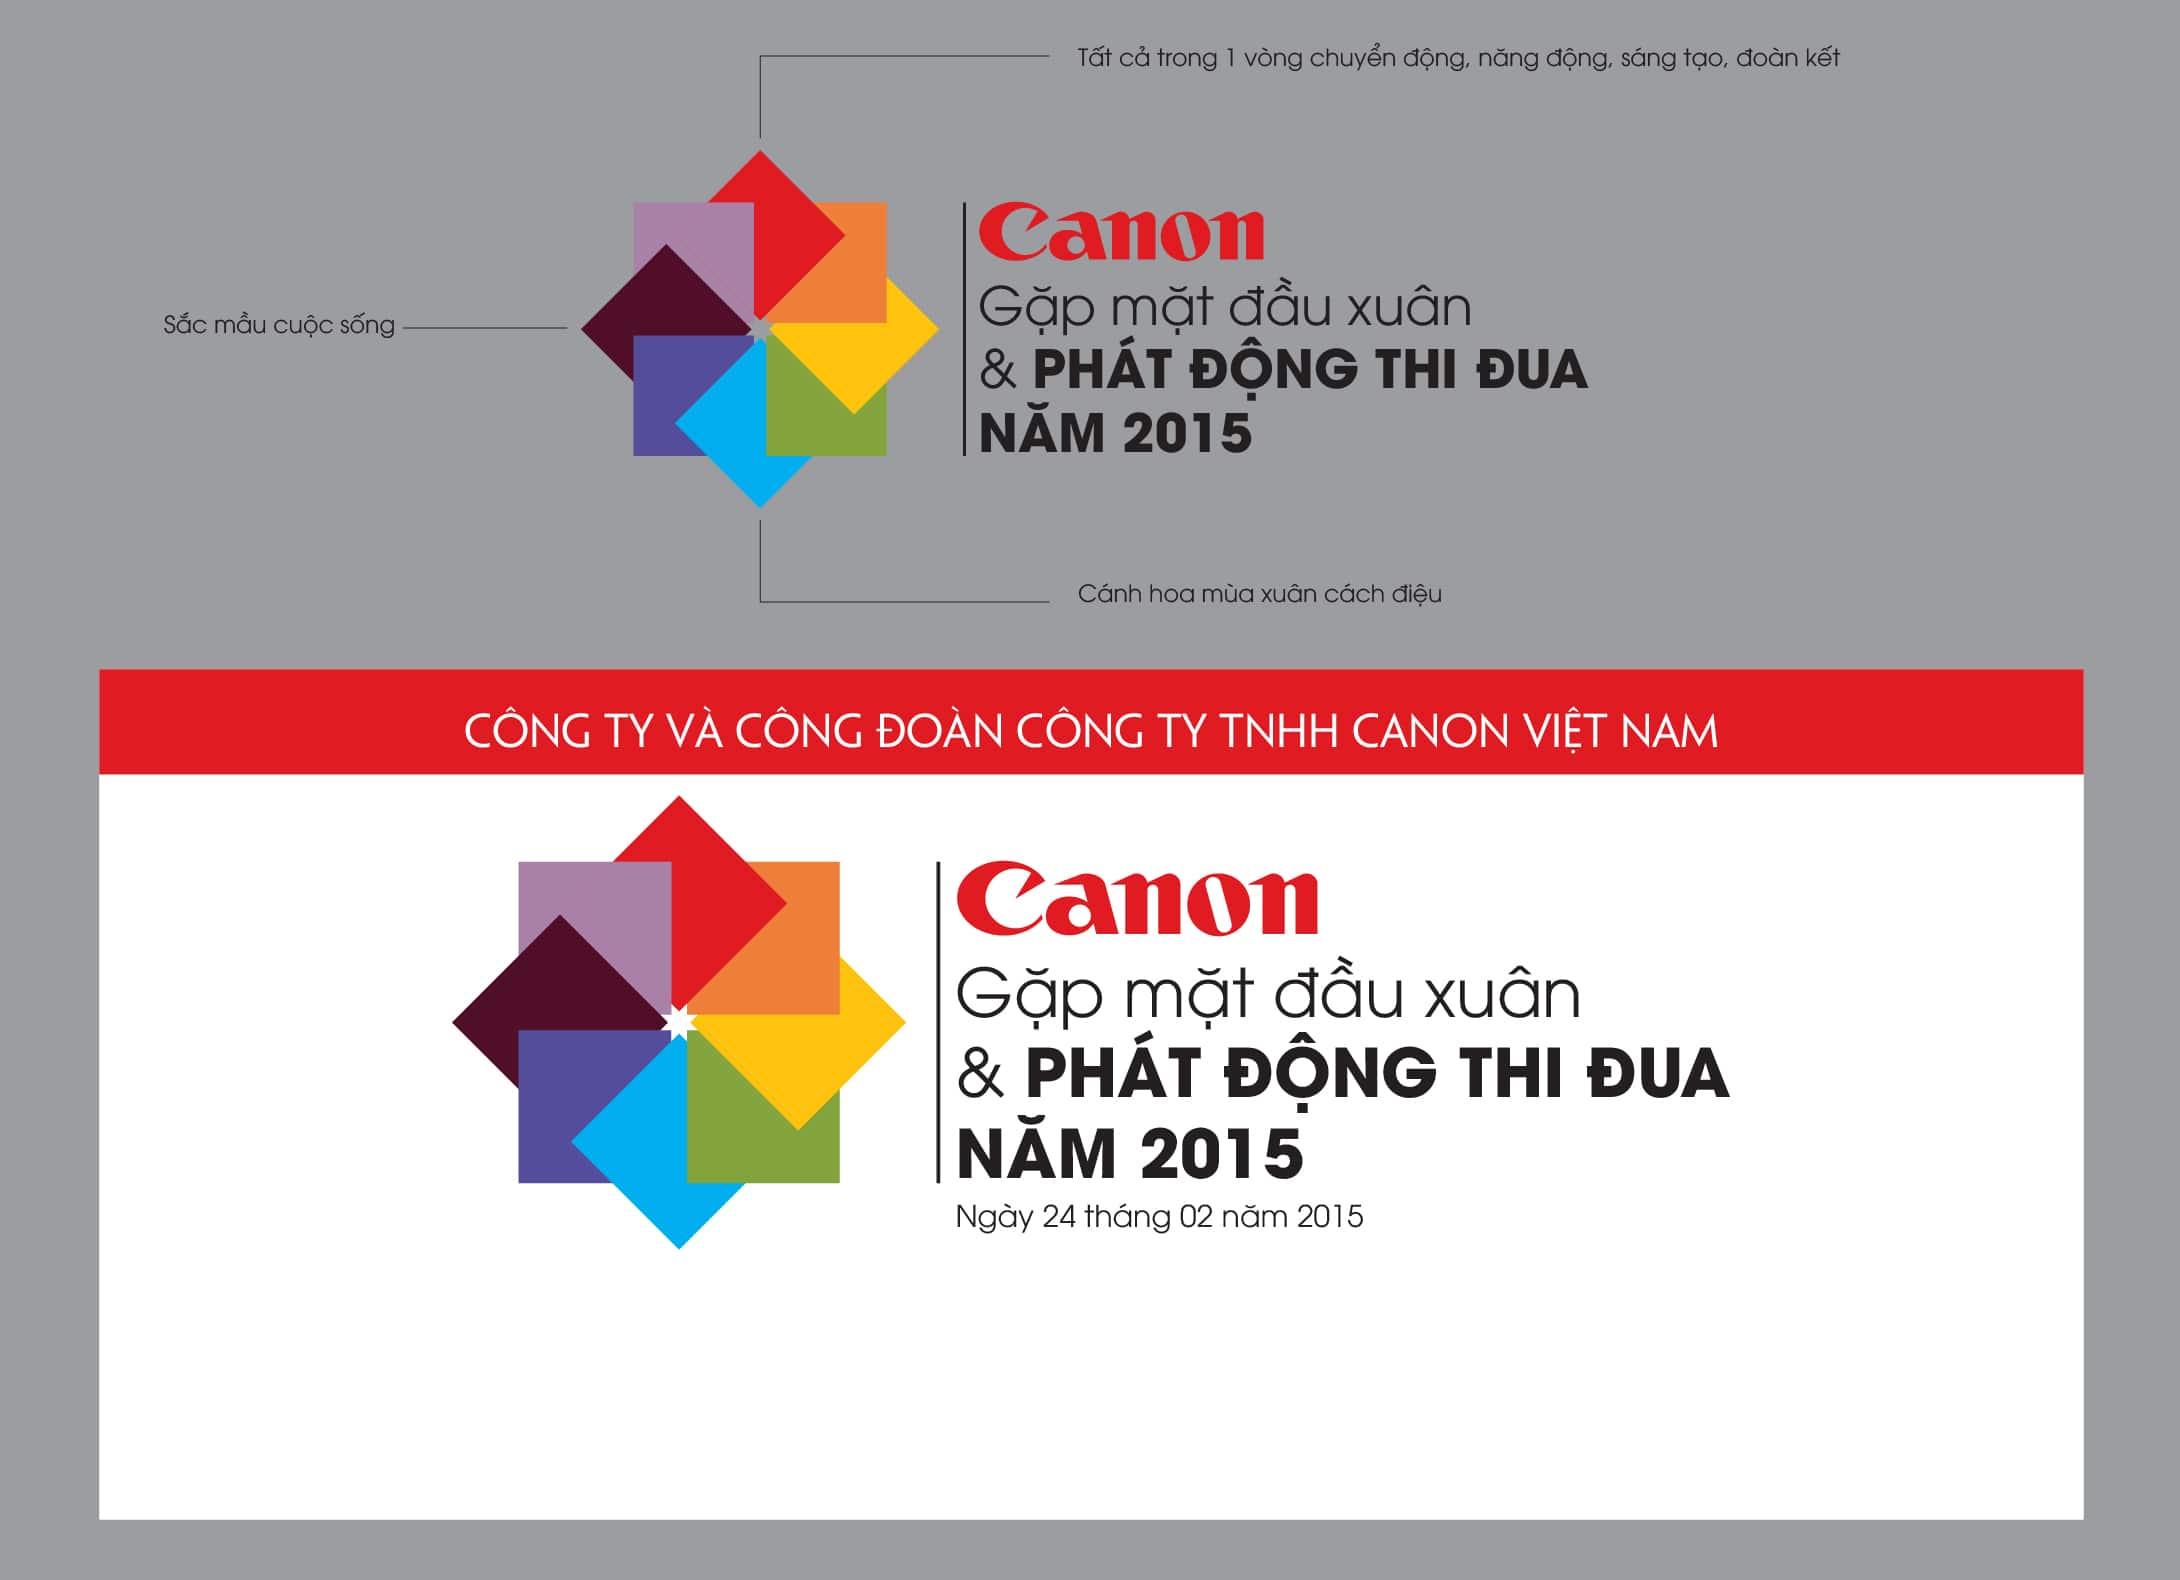 thiet-ke-backdrop-su-kien-gap-mat-dau-xuan-CANON-1